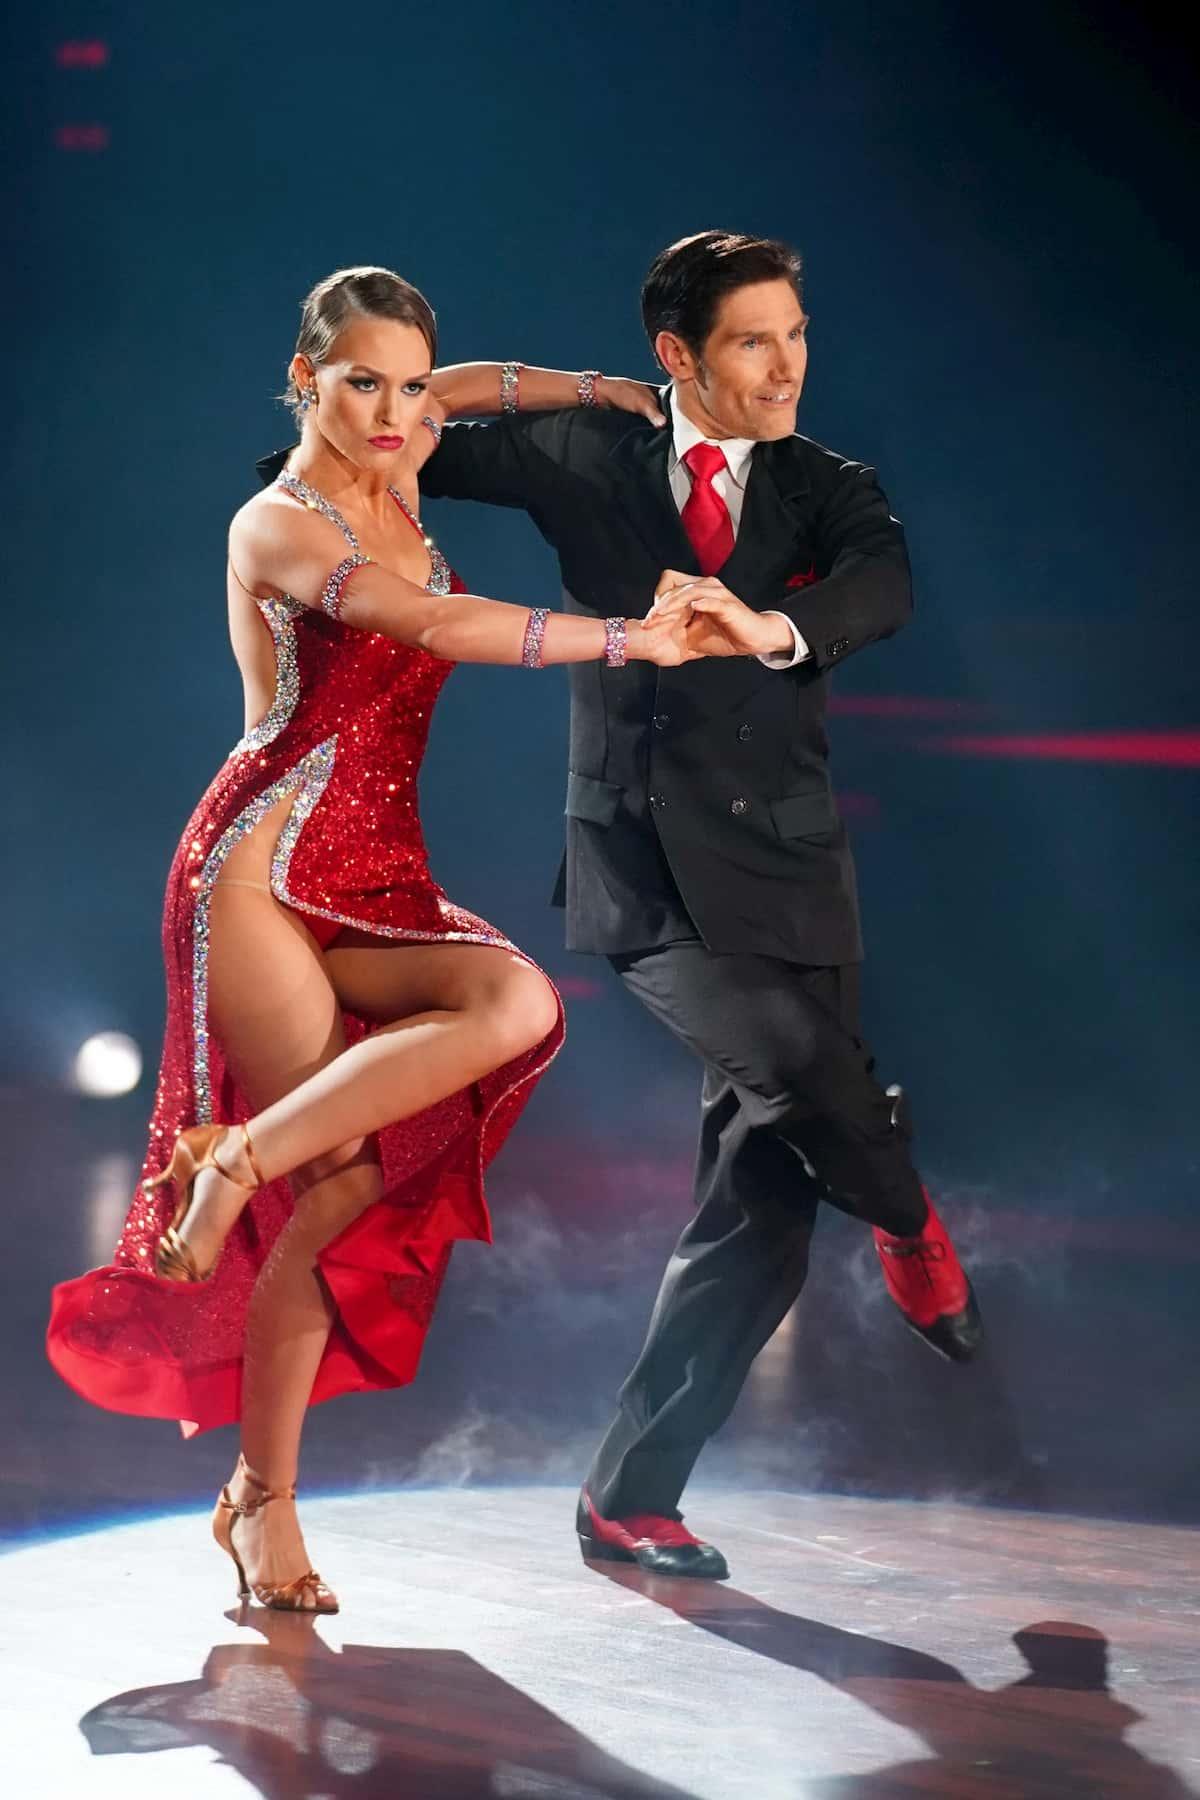 Laura Müller und Christian Polanc Tango Argentino bei Let's dance am 24.4.2020